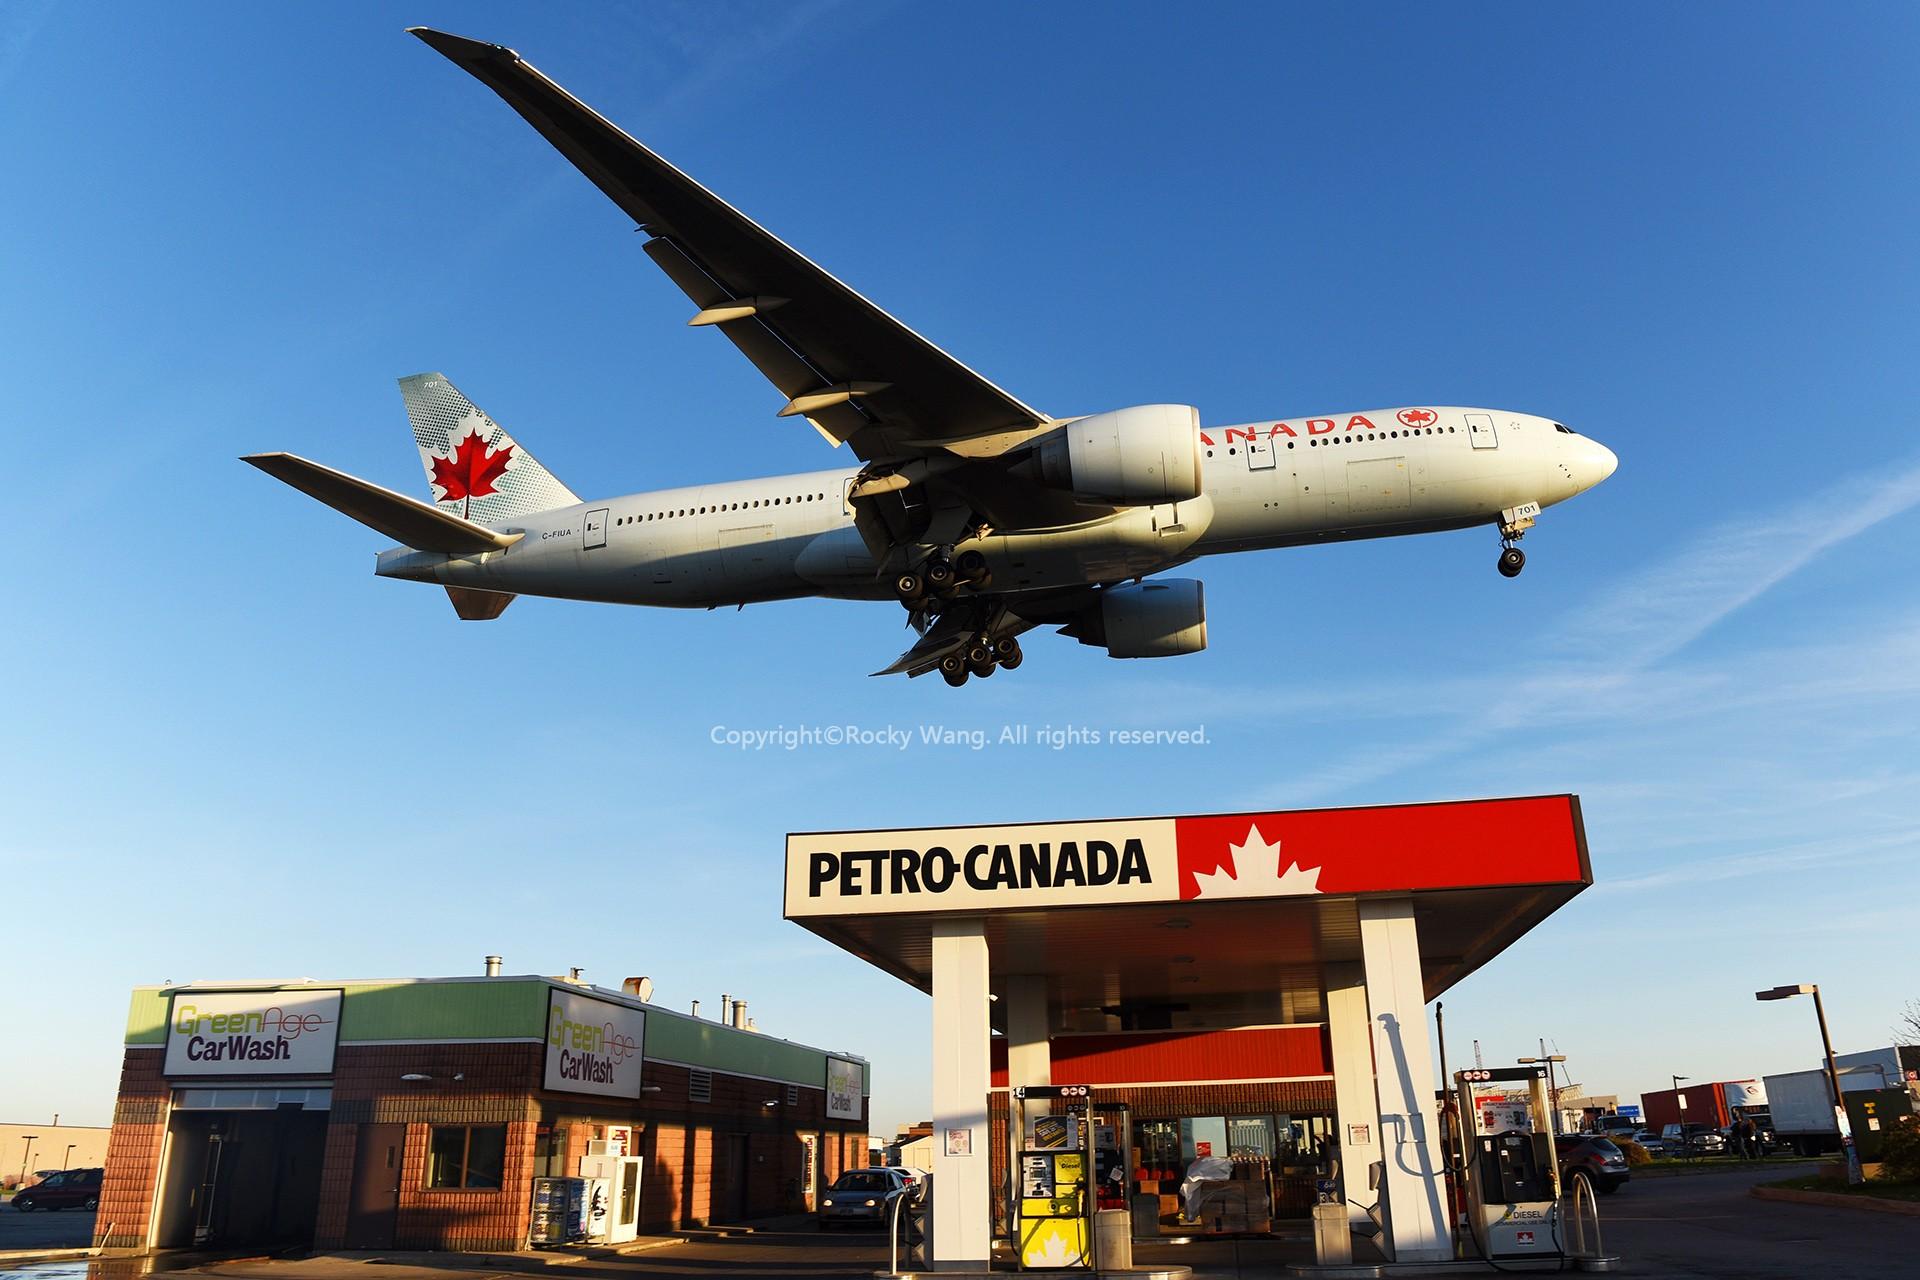 Re:[原创]CYYZ 30图 BOEING 777-233LR C-FIUA Toronto Lester B. Pearson Int'l Airport